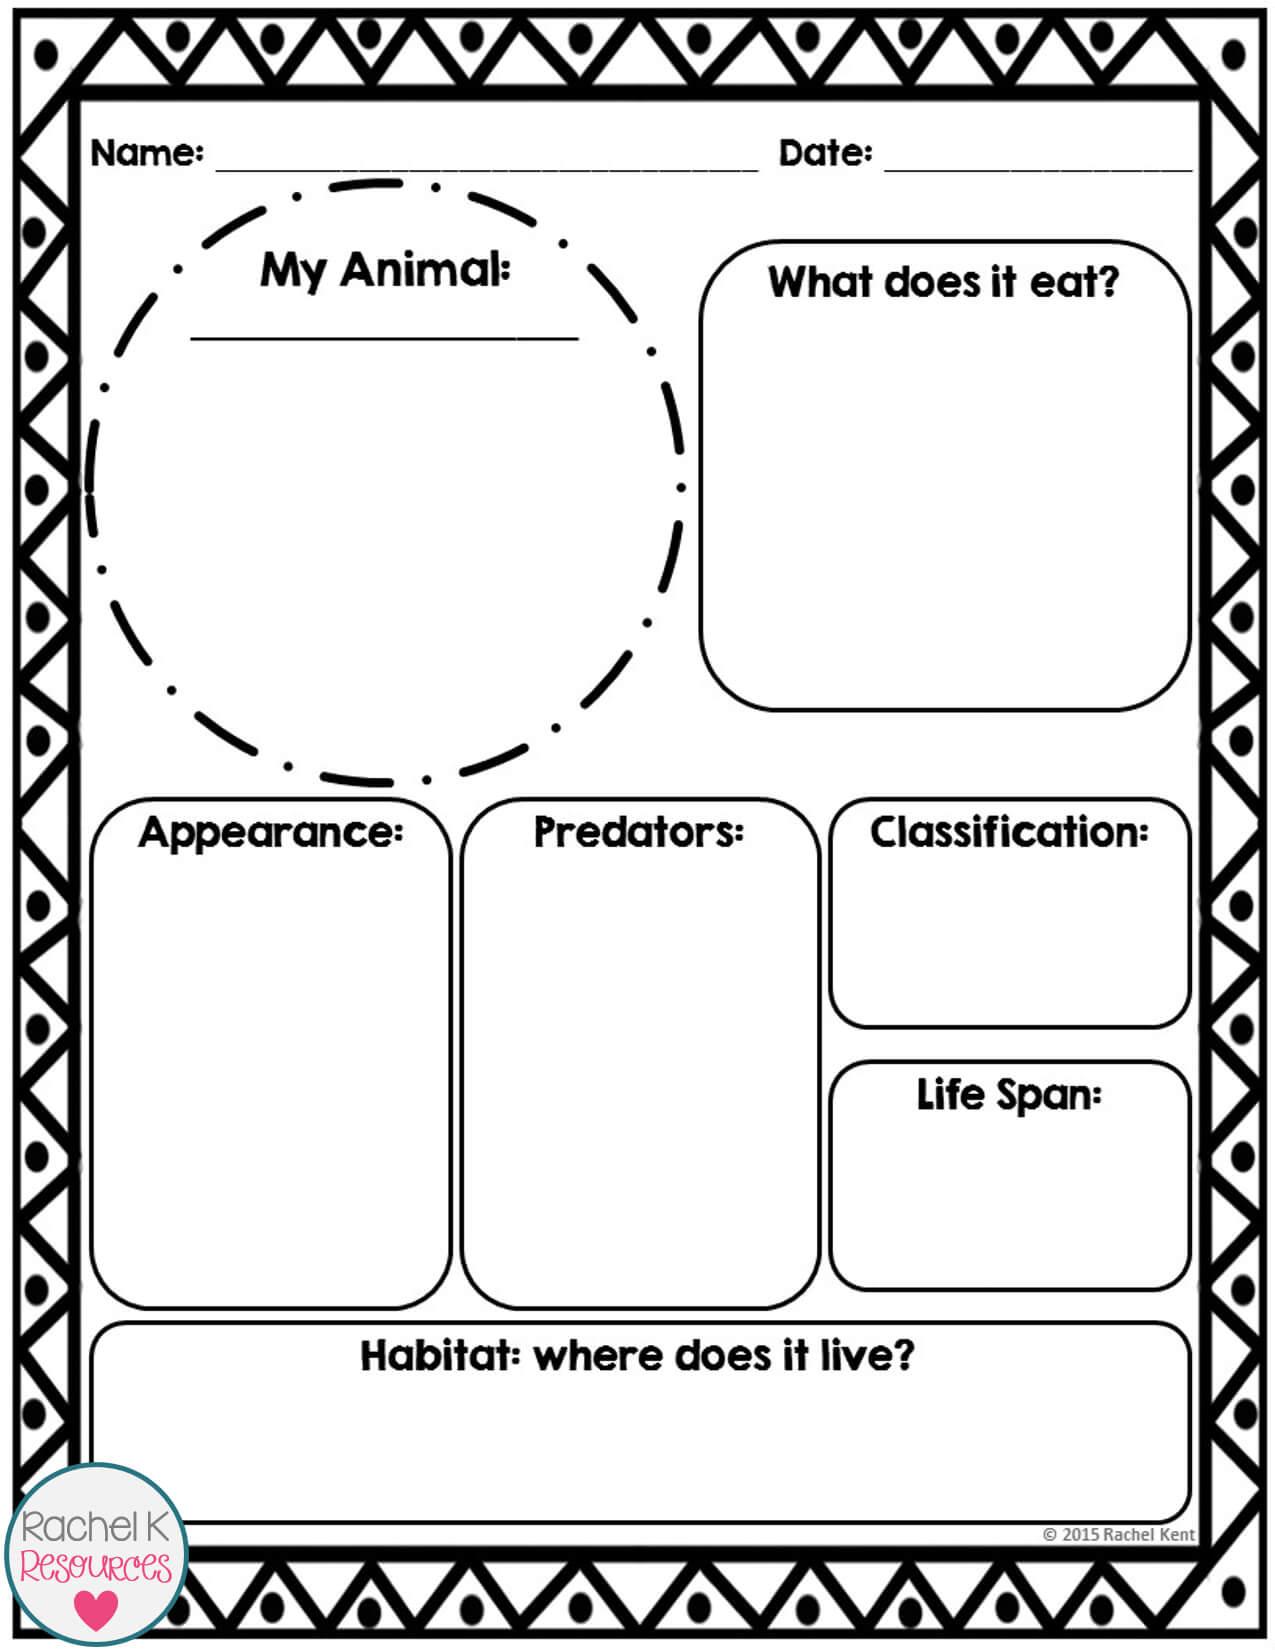 Animal Report Template | Information Report, Report Template Pertaining To Template For Information Report